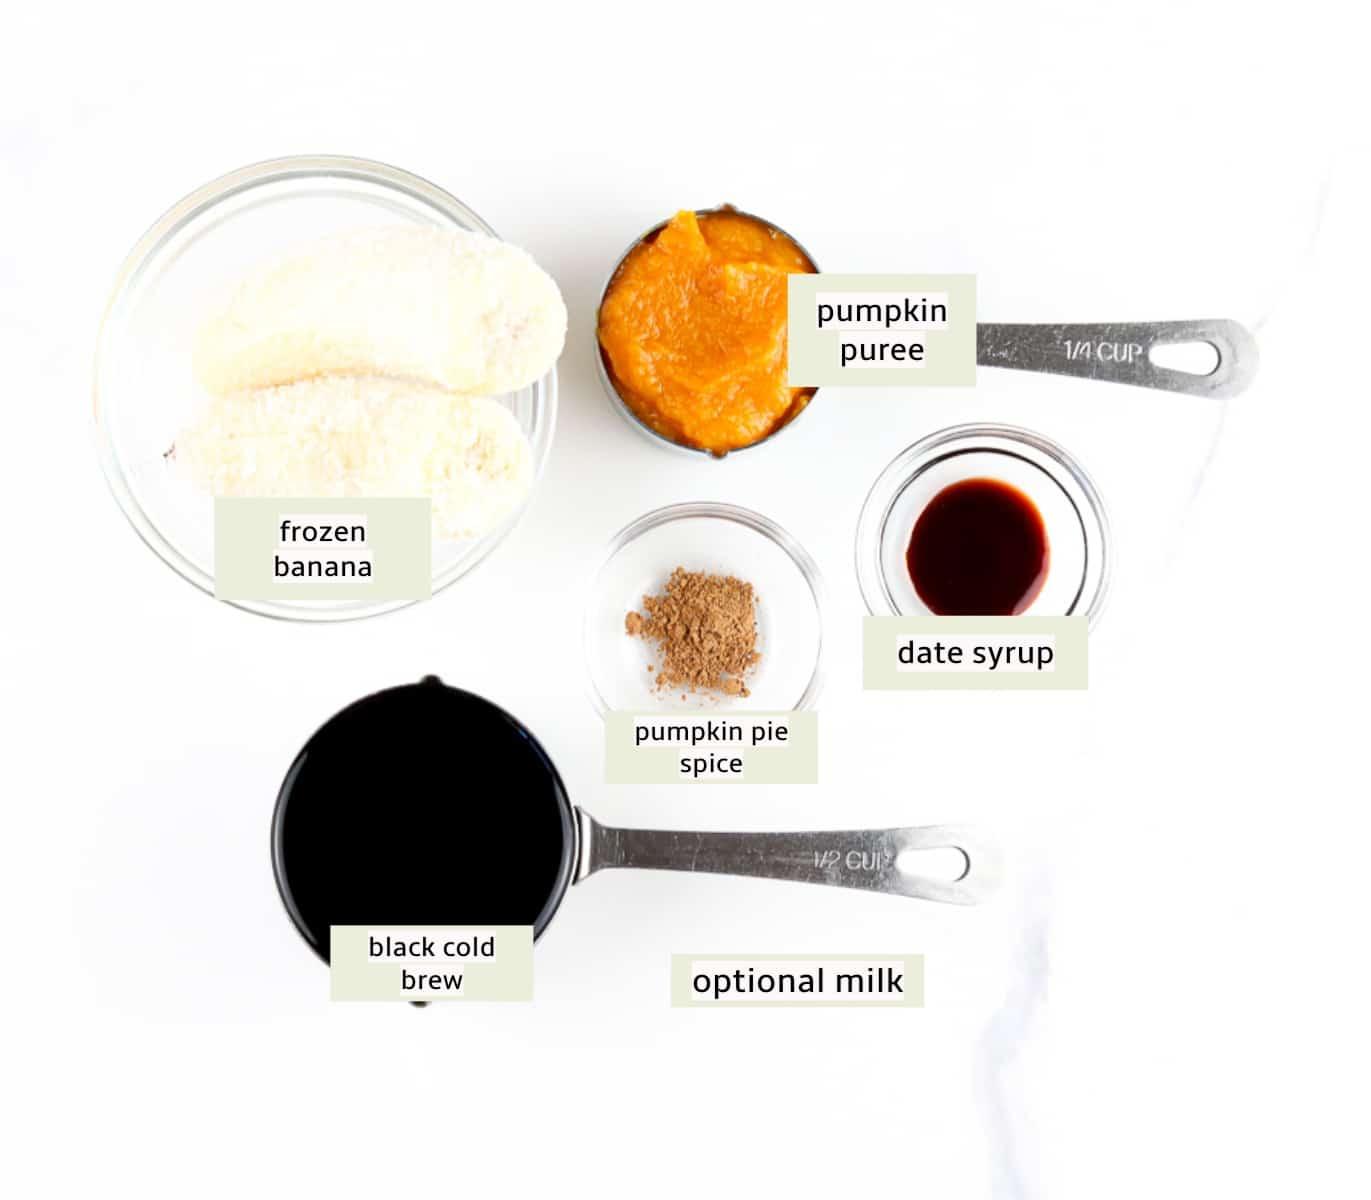 Ingredients to make frozen PSL.